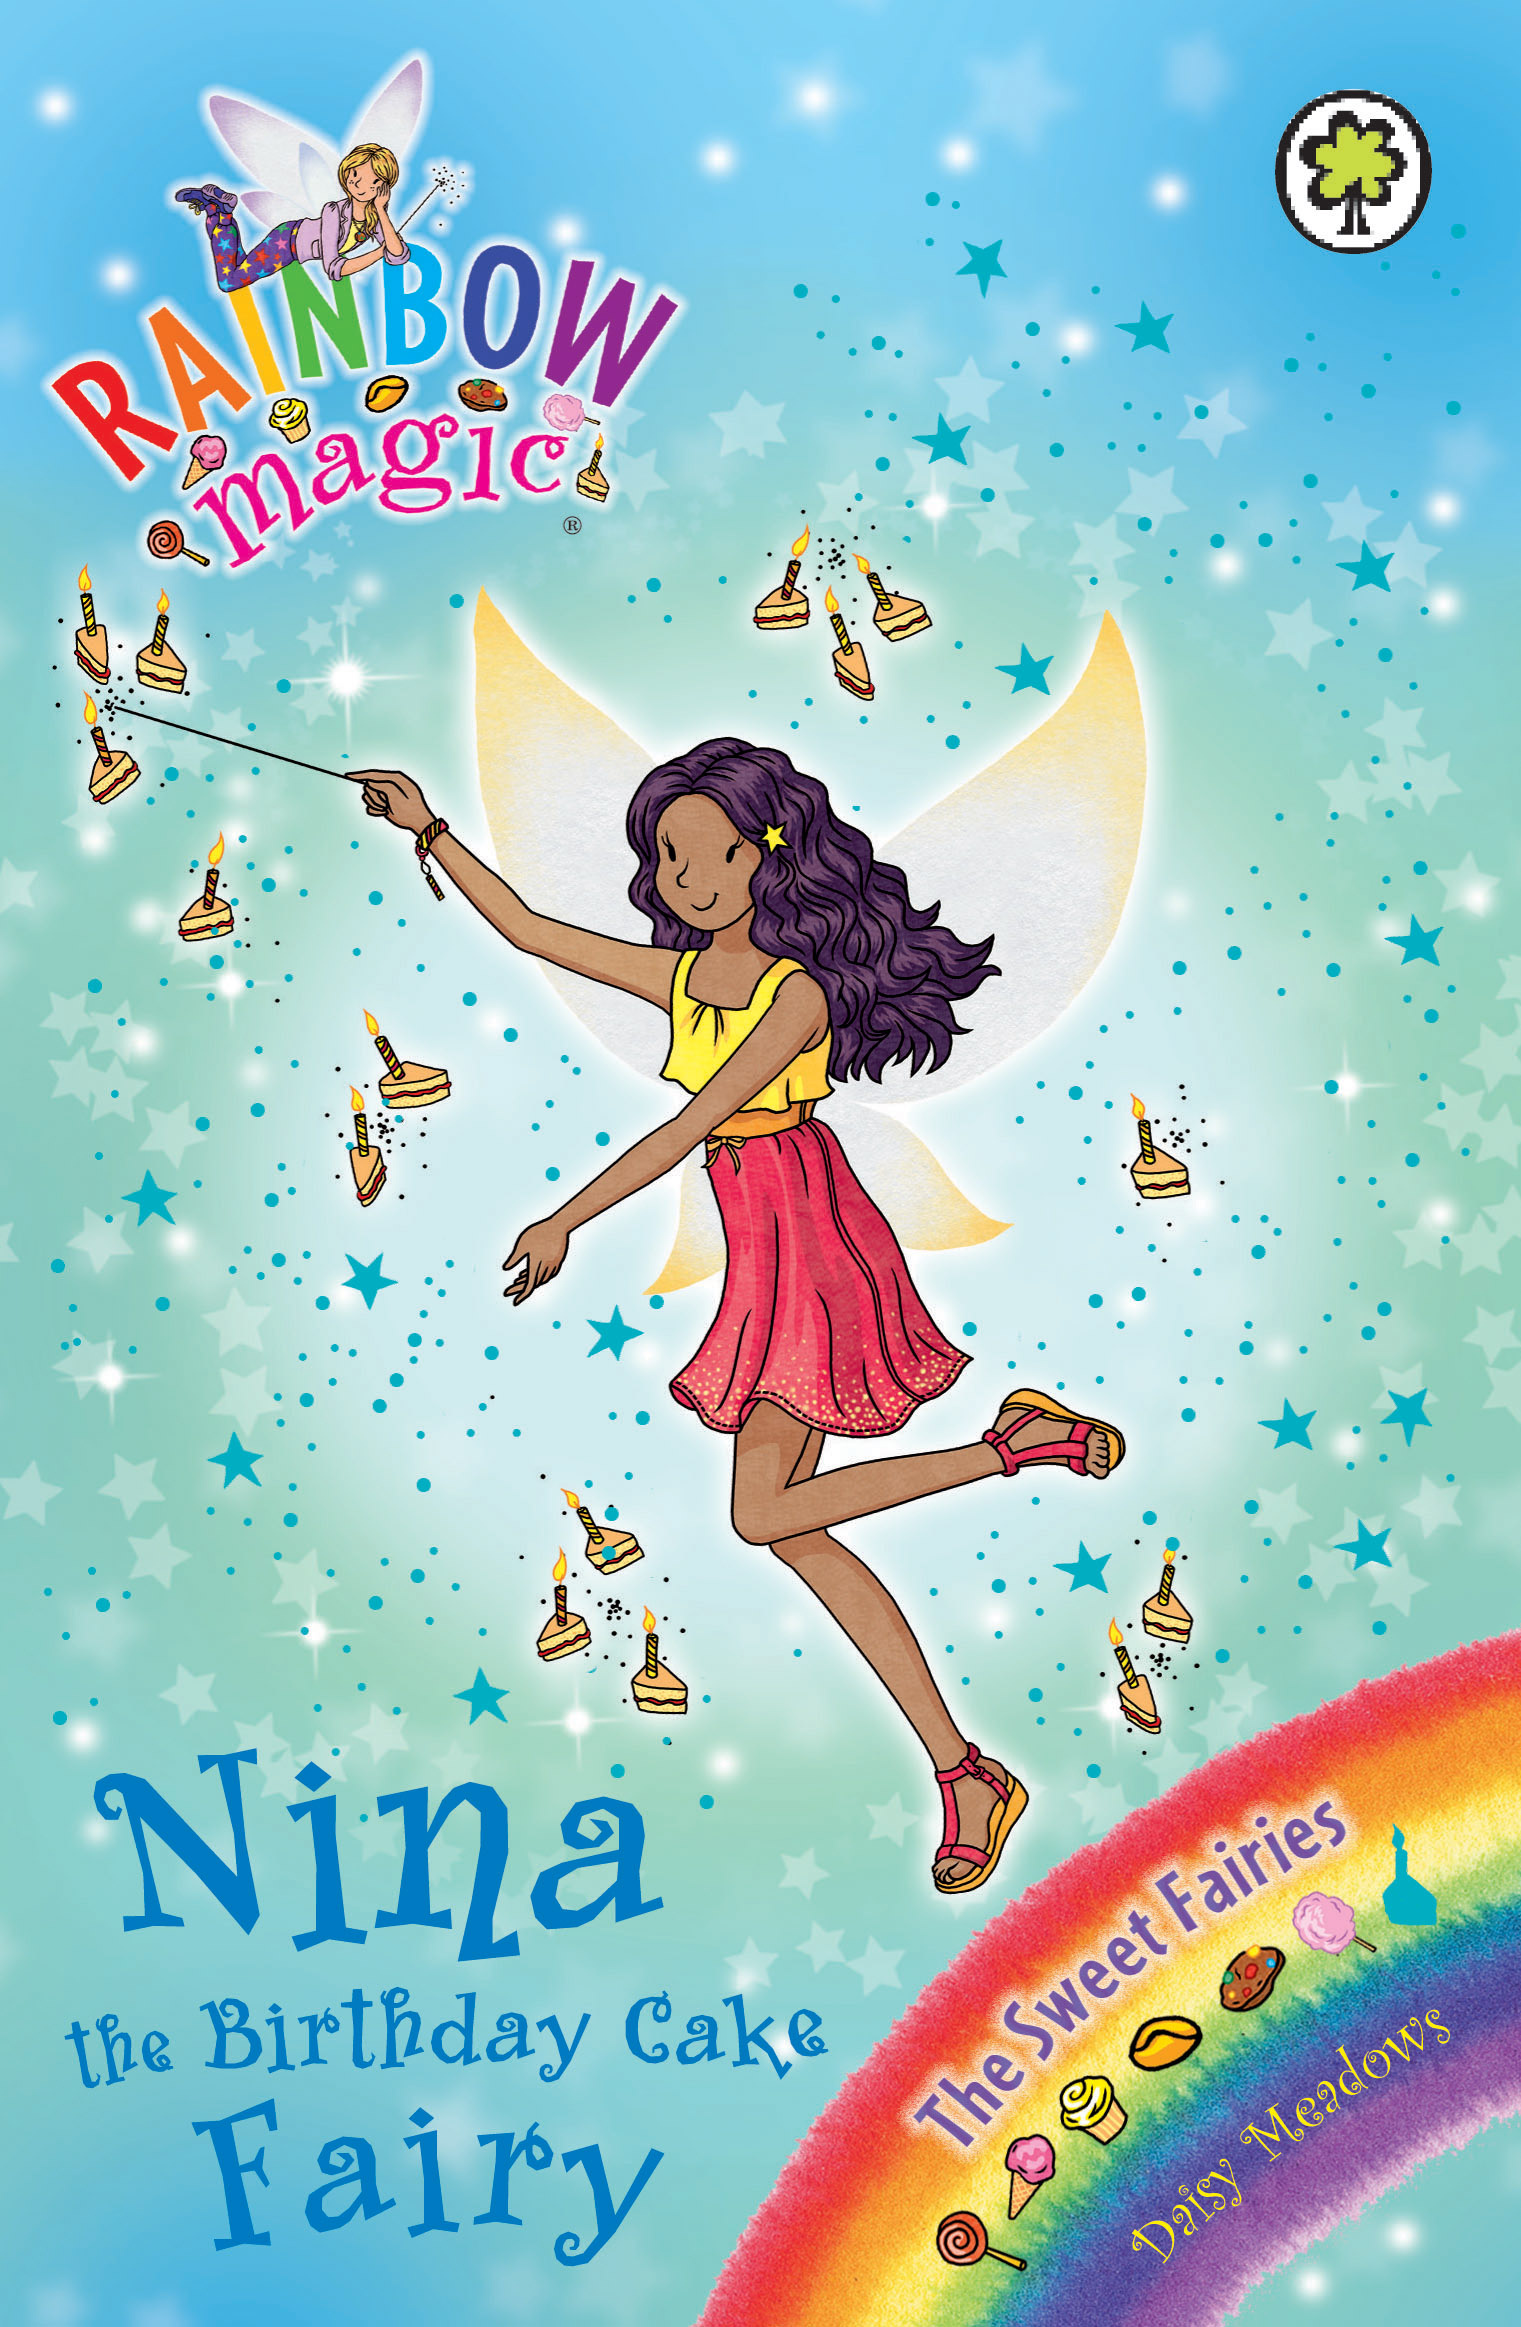 nina the birthday cake fairy rainbow magic wiki fandom powered by wikia. Black Bedroom Furniture Sets. Home Design Ideas